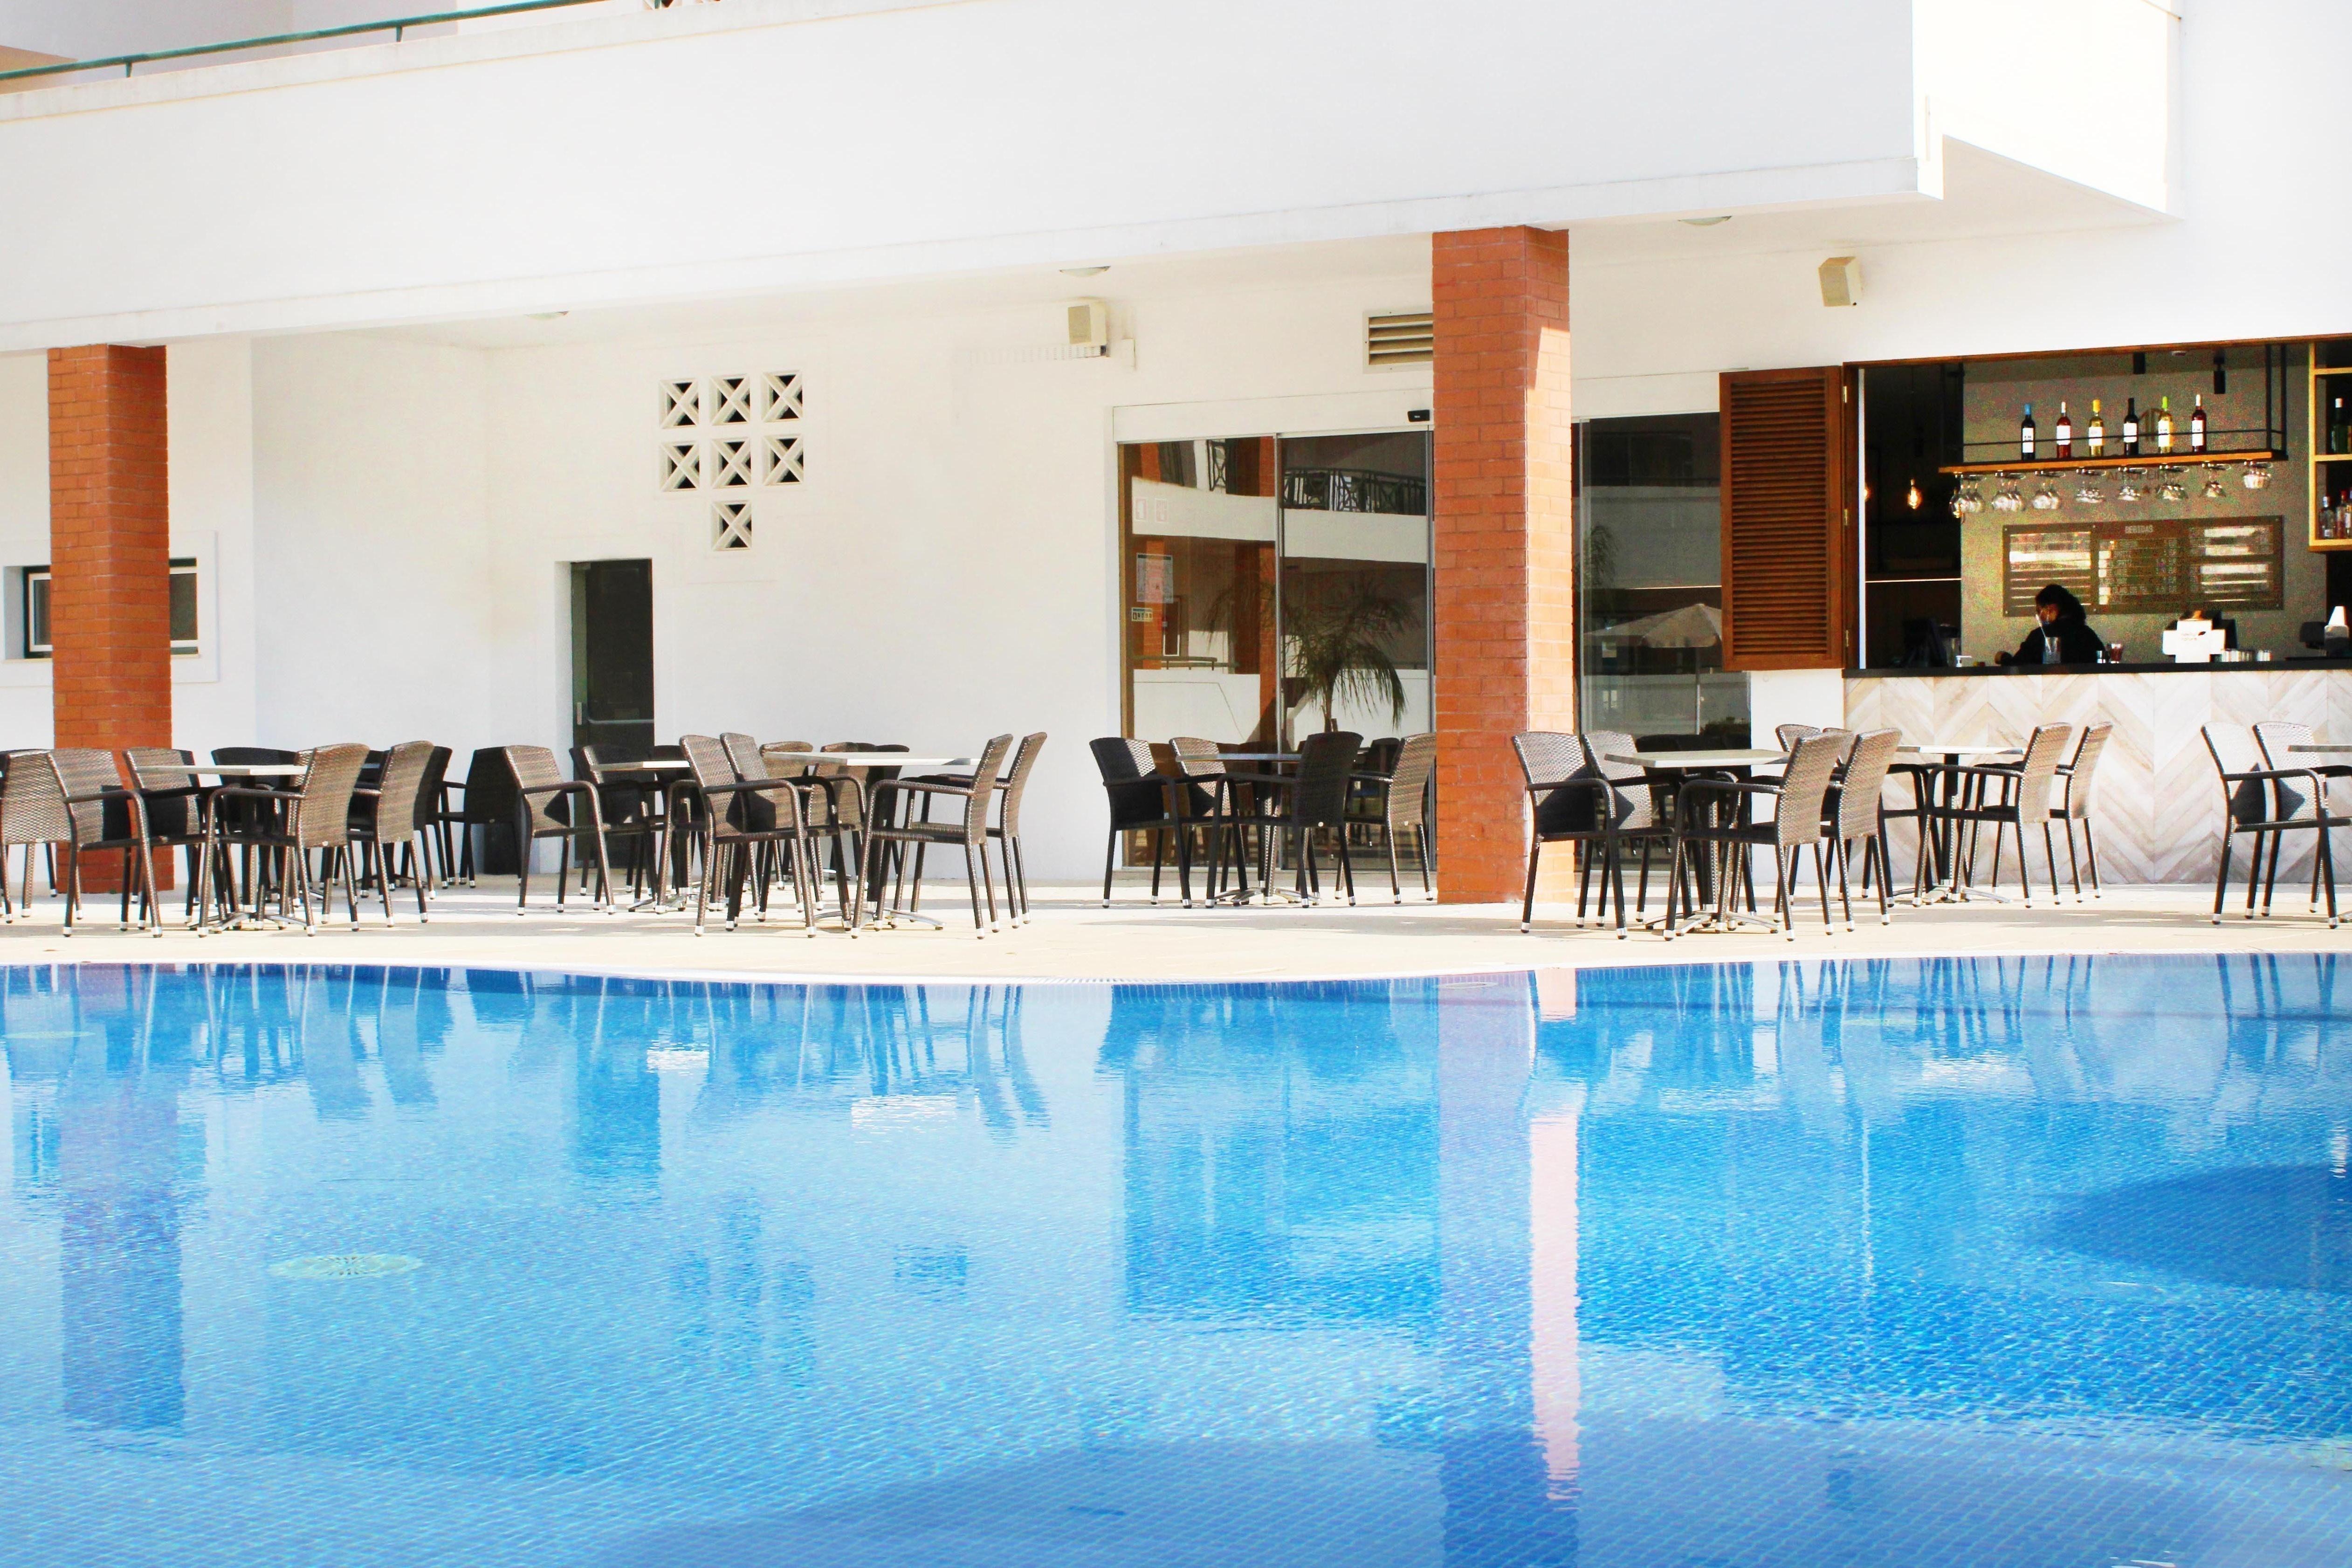 hotels/hotel_5/image_7.jpg